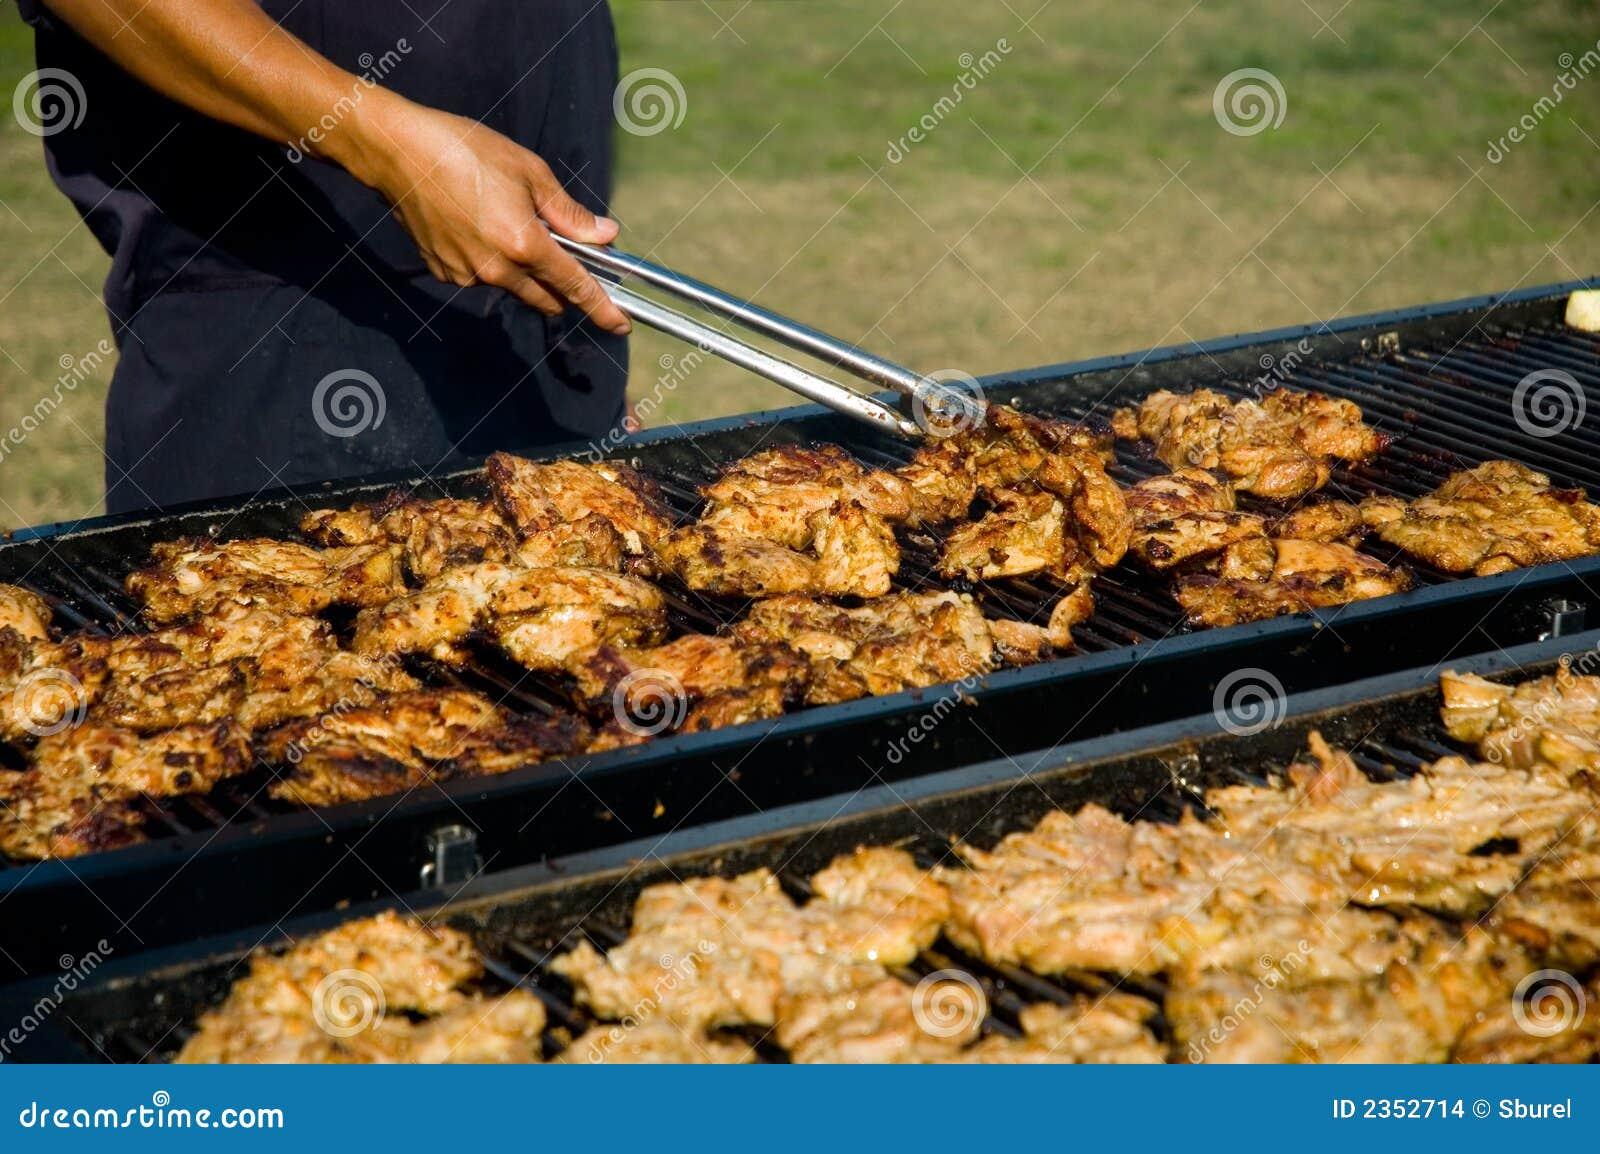 Bbq chickencooking